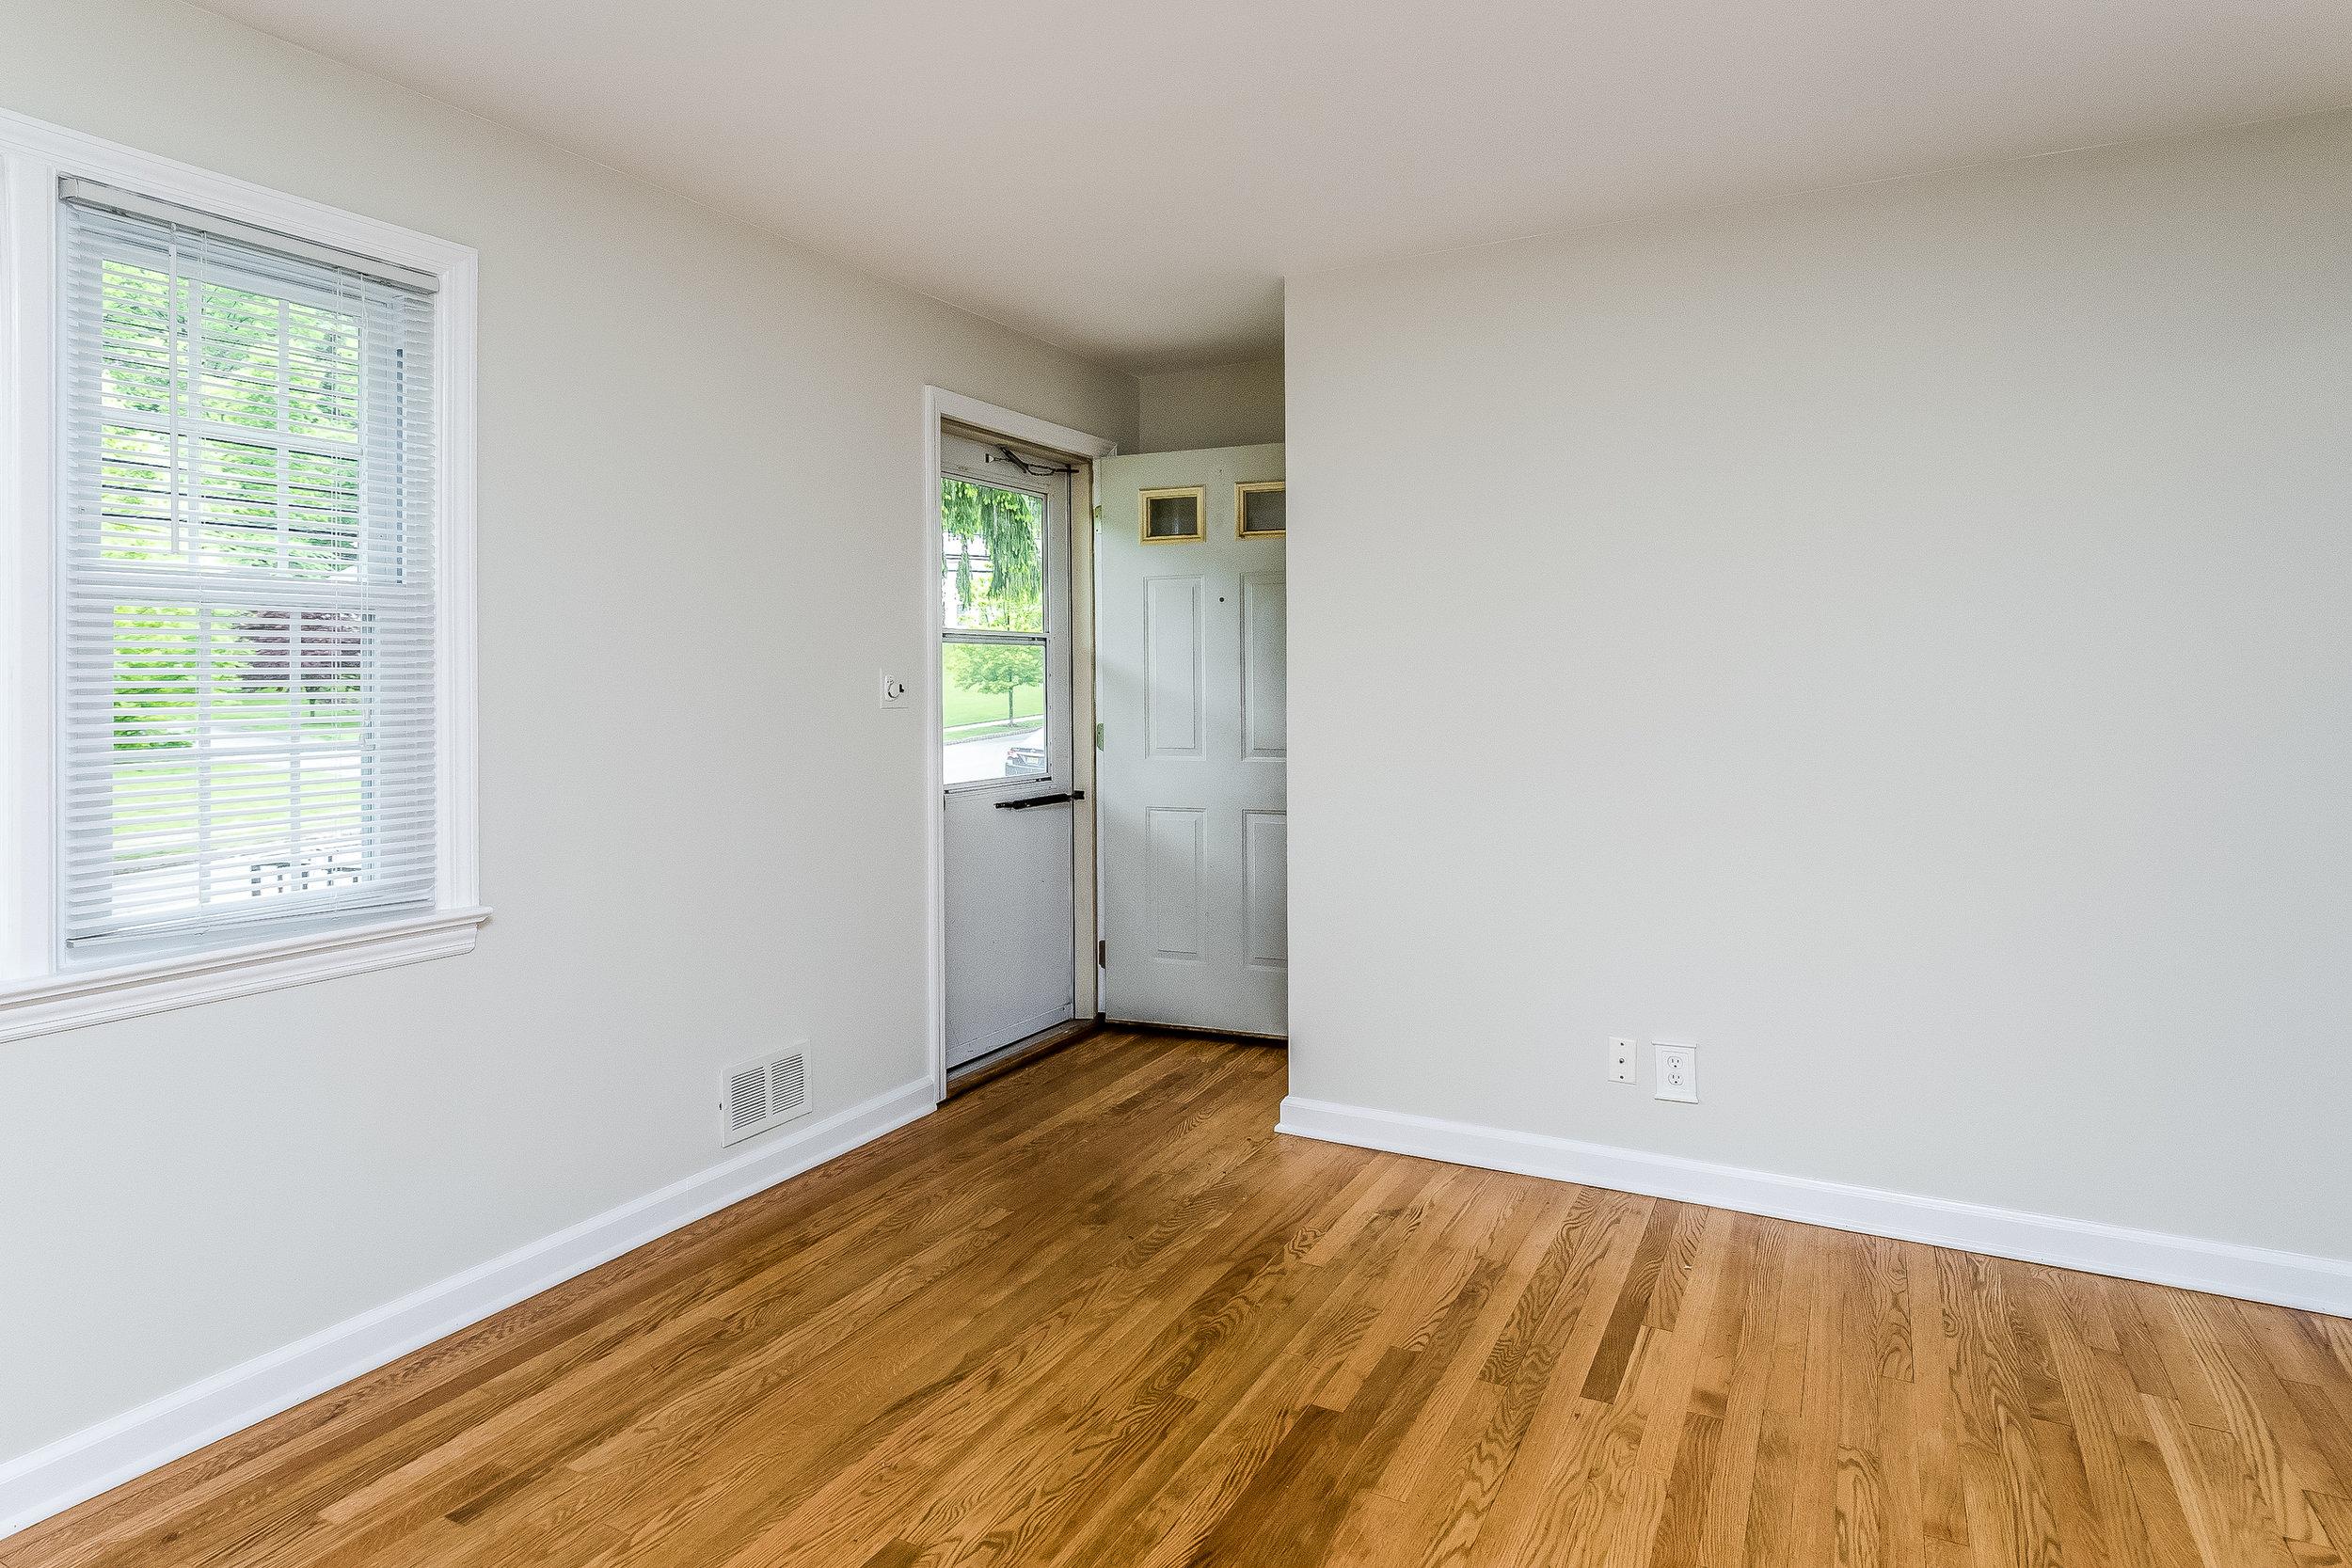 011-photo-living-room-5786553.jpg